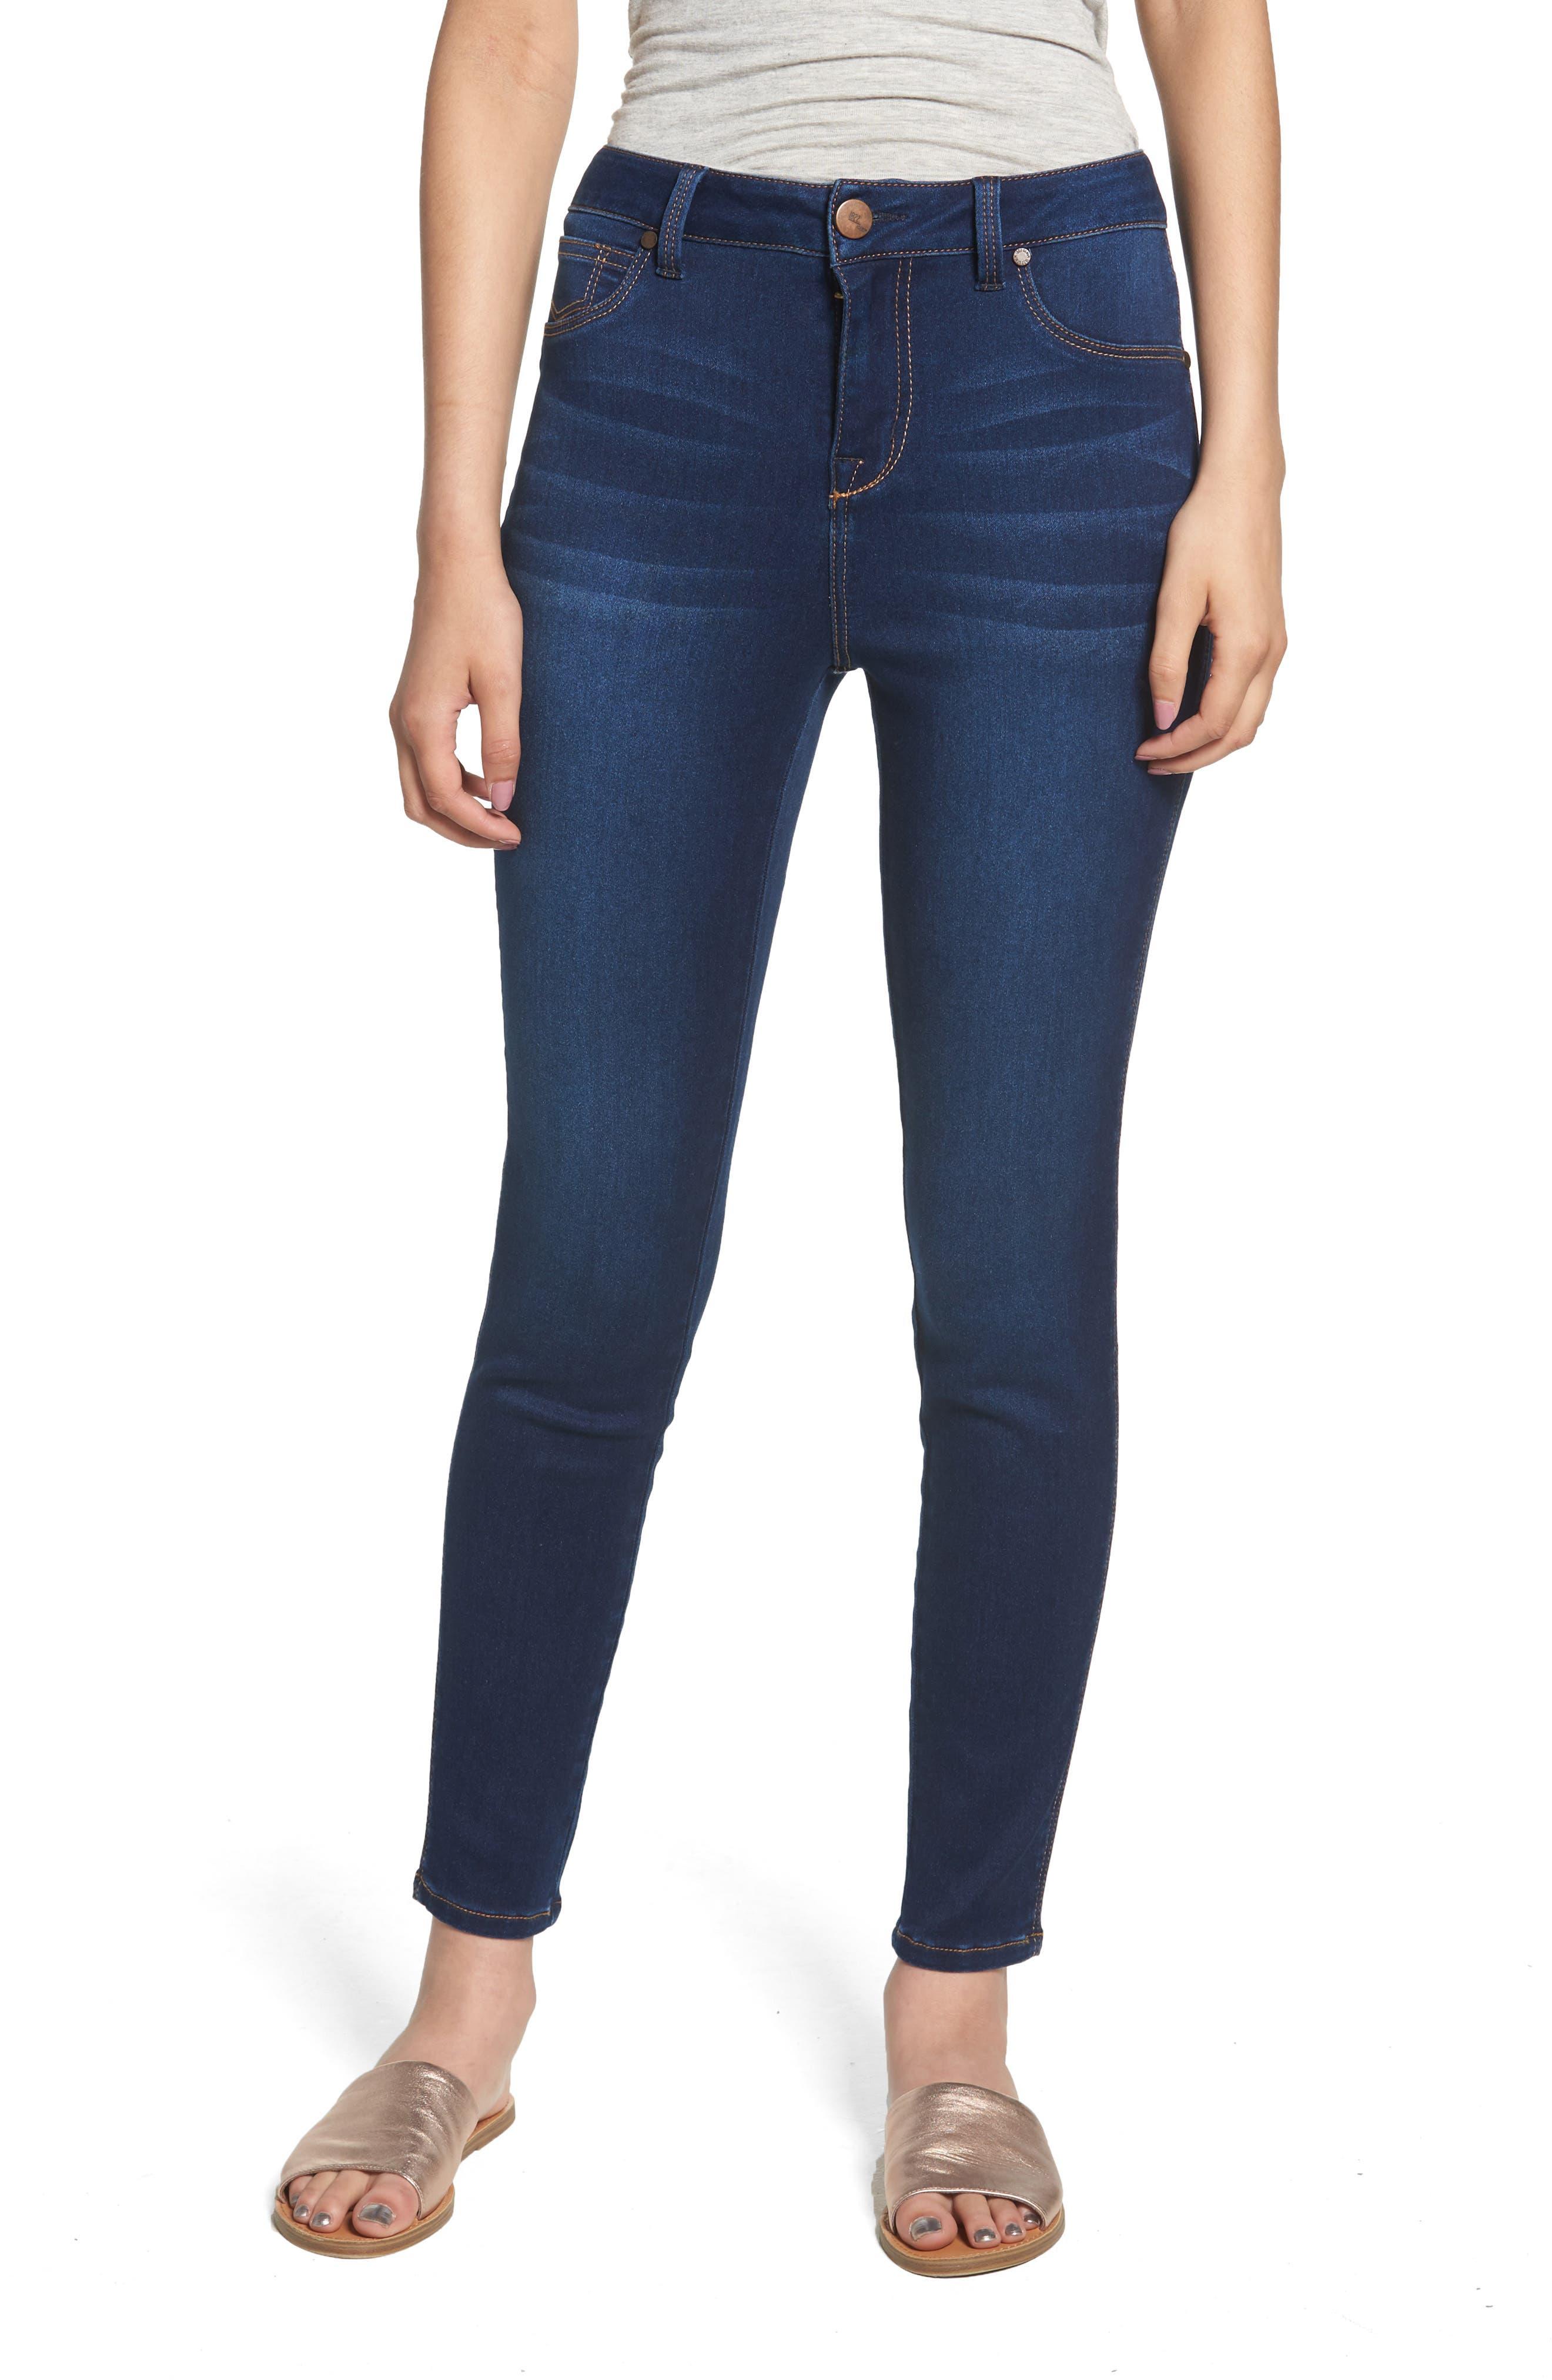 1822 DENIM Butter High Rise Skinny Jeans, Main, color, LENNOX